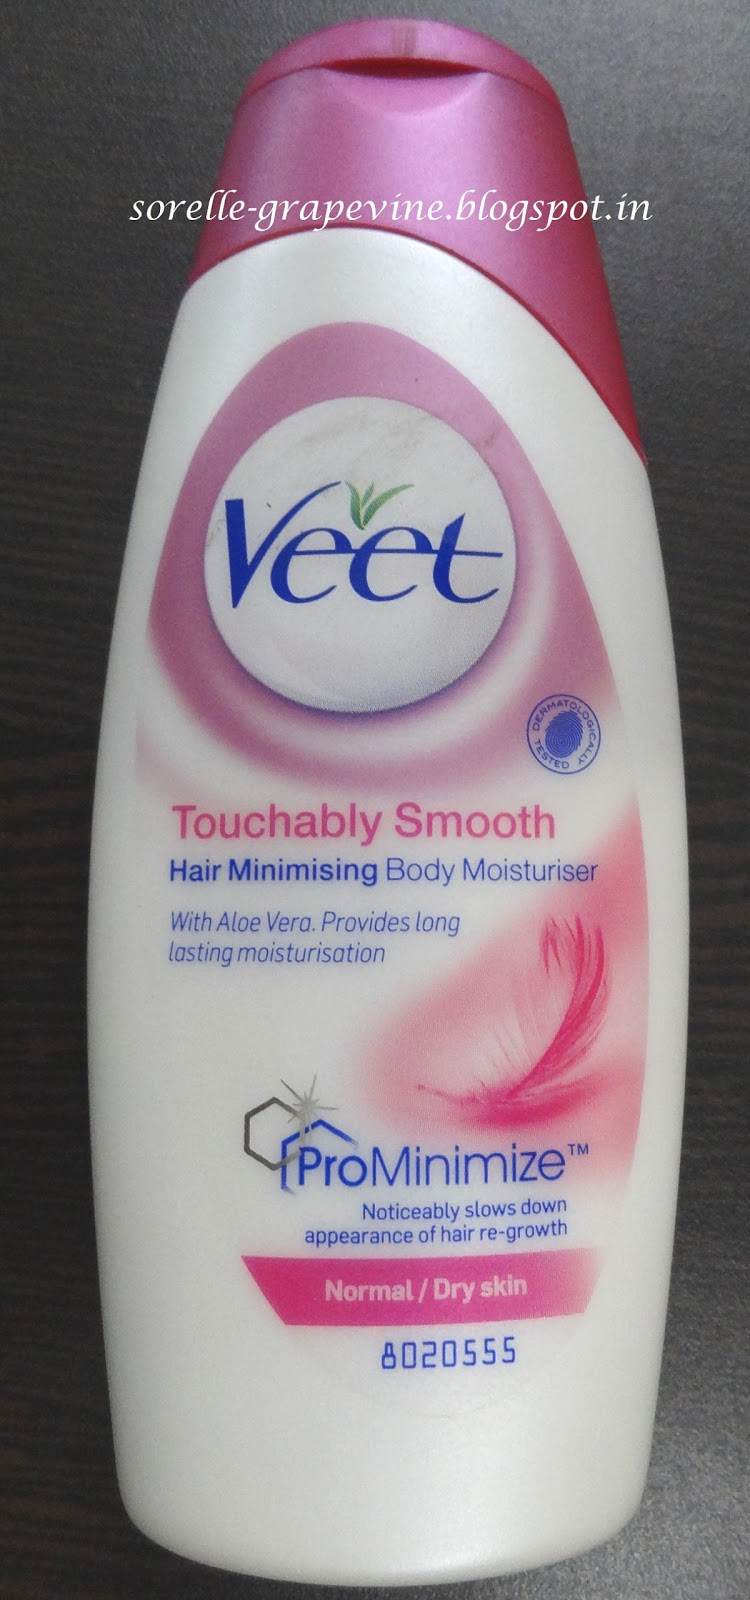 hair minimizing facial moisturizers